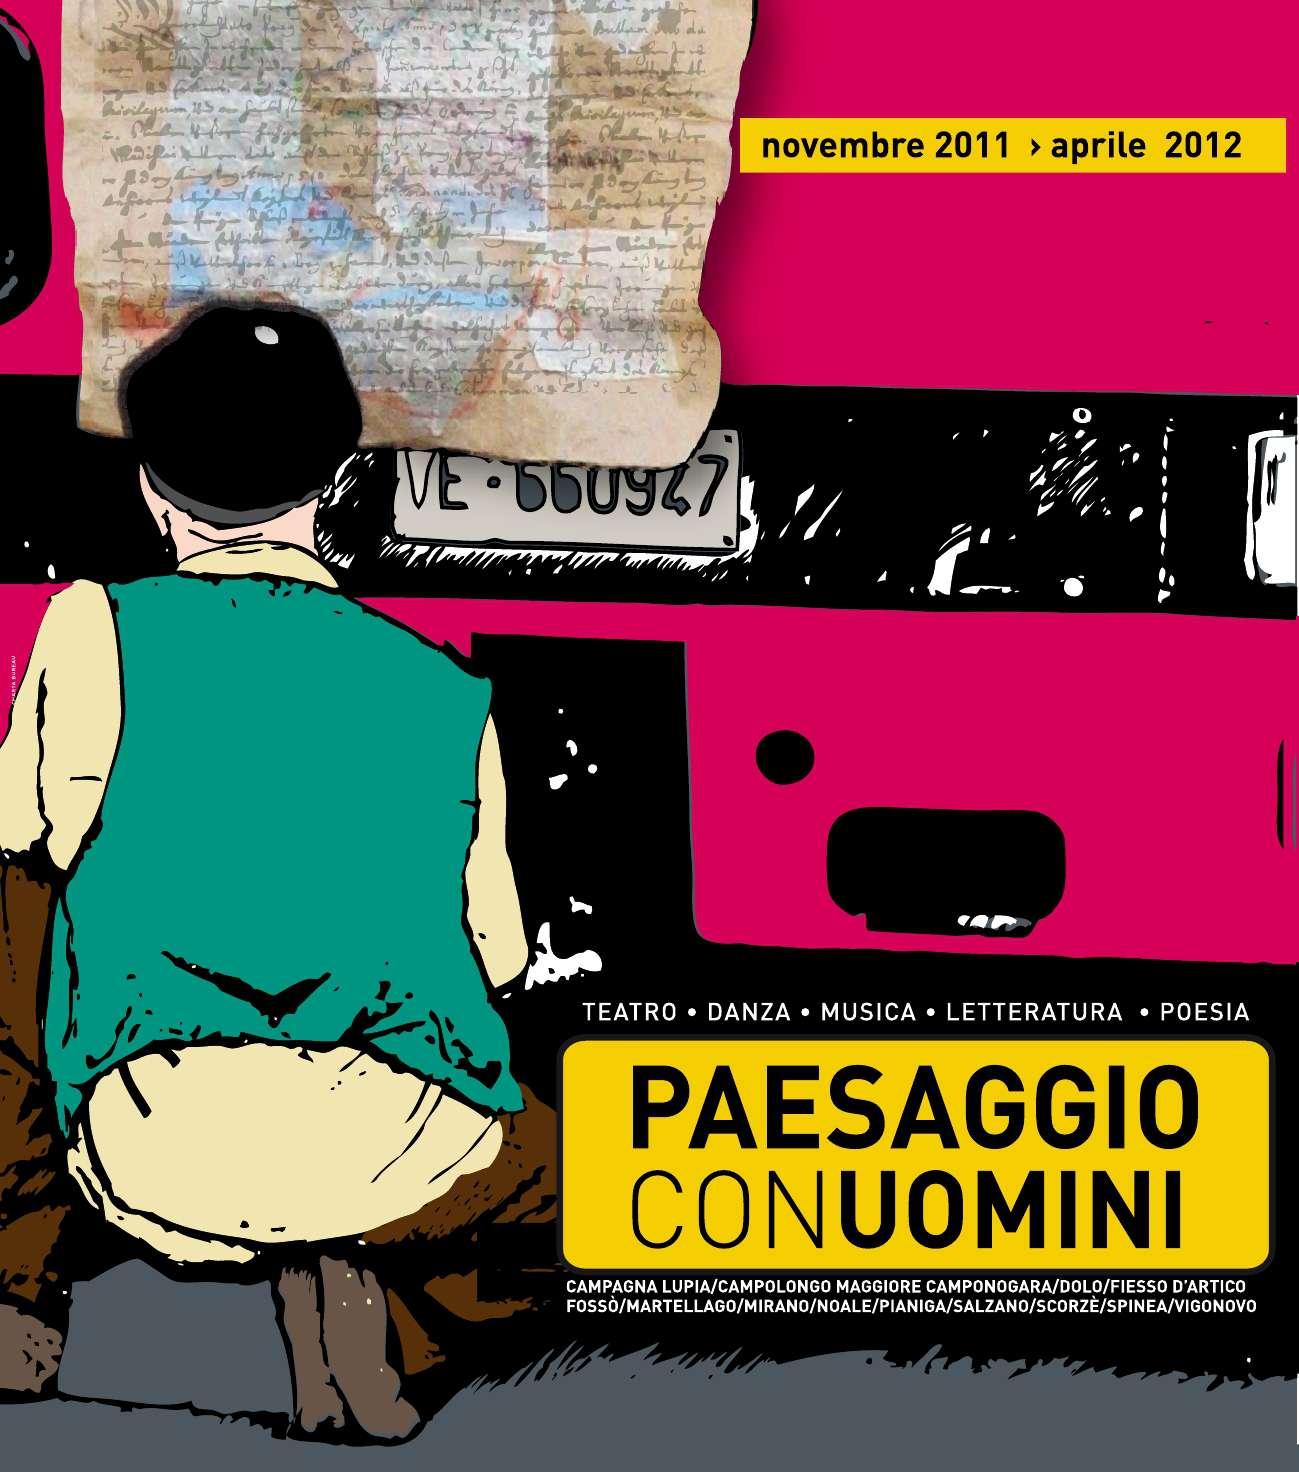 paesaggio 2011 logo.jpg